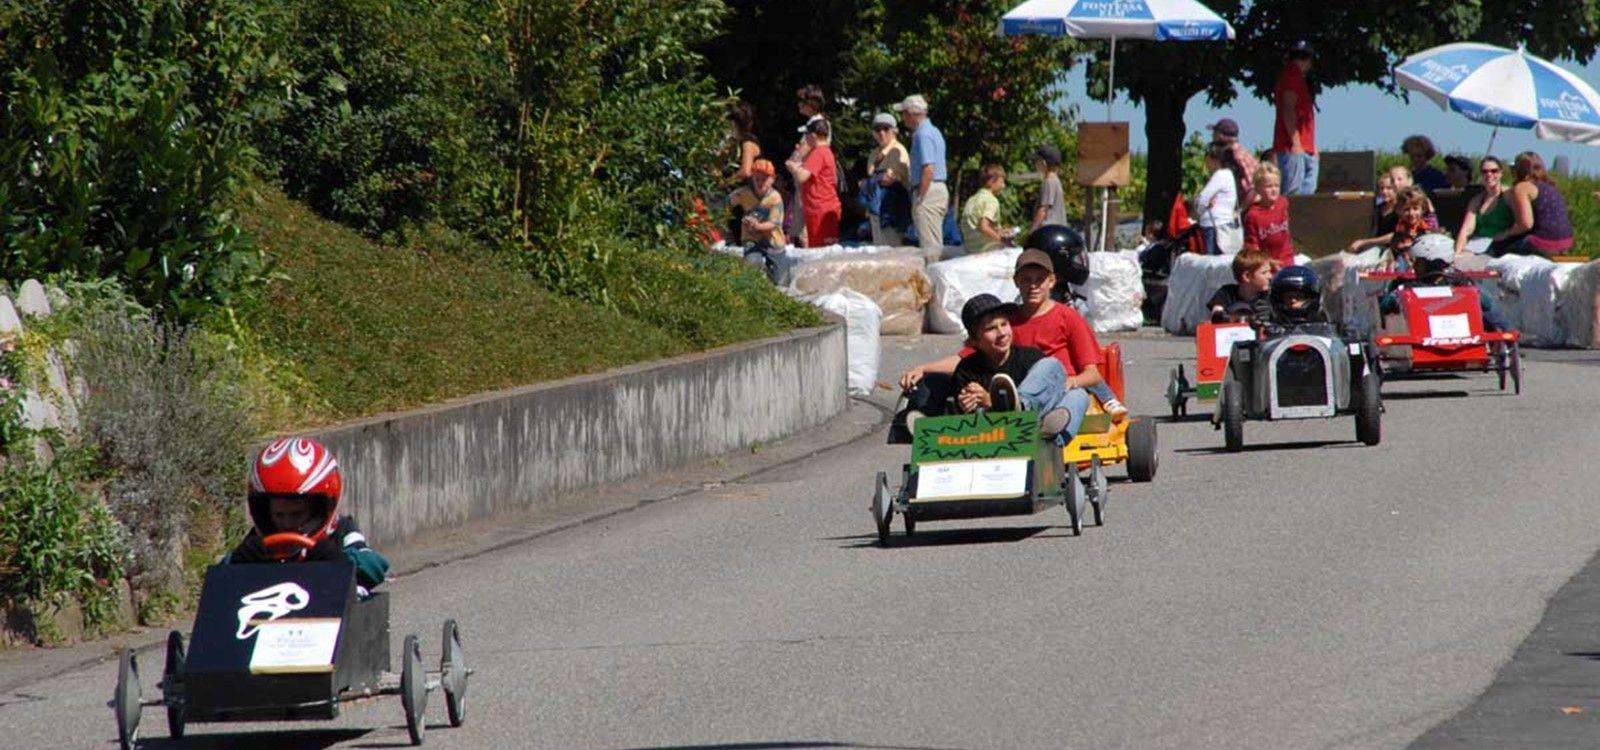 First soapbox race derby cars car derby